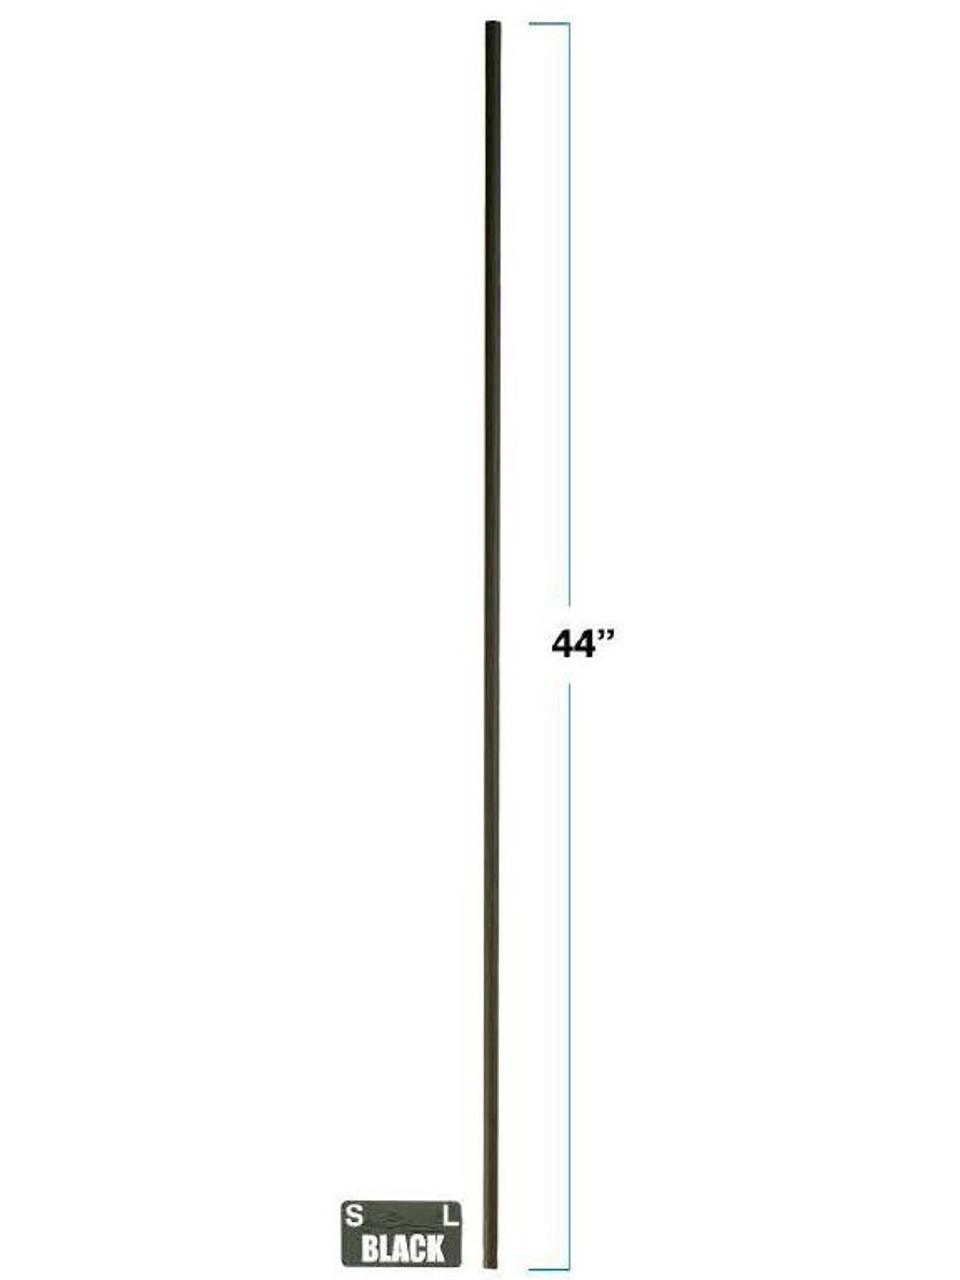 2970 Plain Round Gothic Baluster Dimensional Information